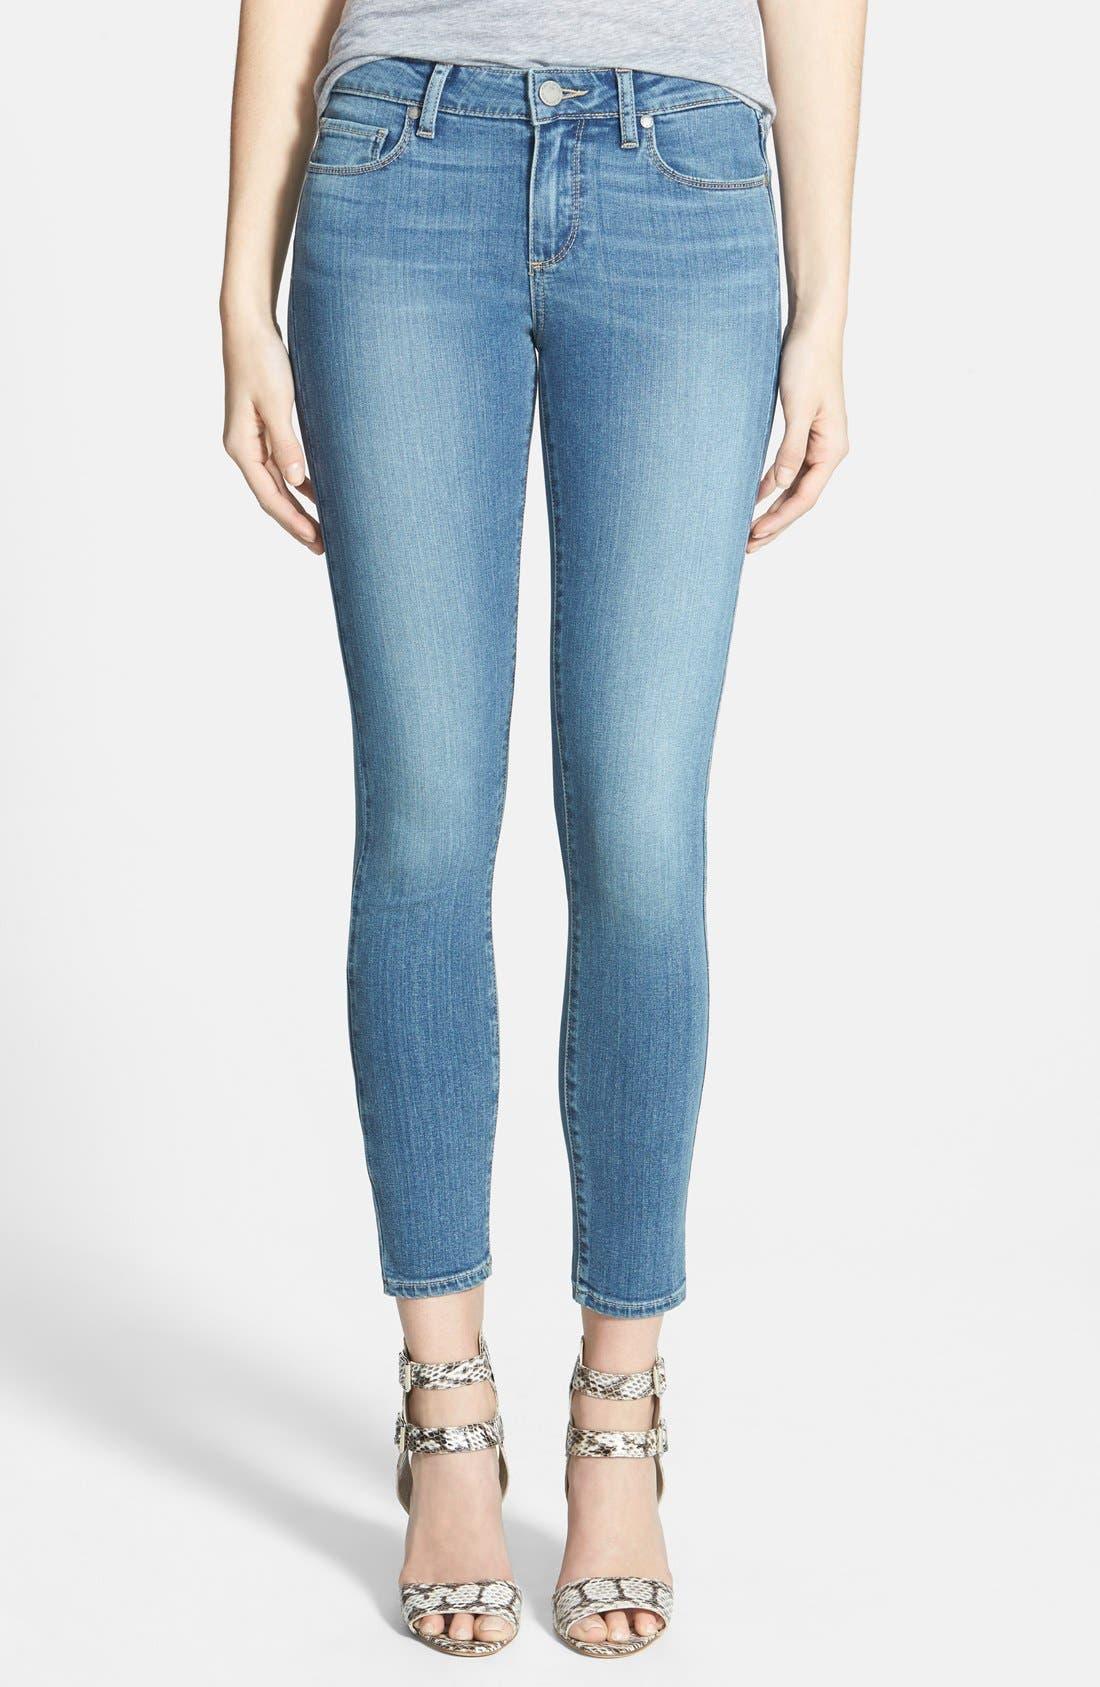 Alternate Image 1 Selected - Paige Denim 'Verdugo' Ankle Skinny Jeans (Tegan)